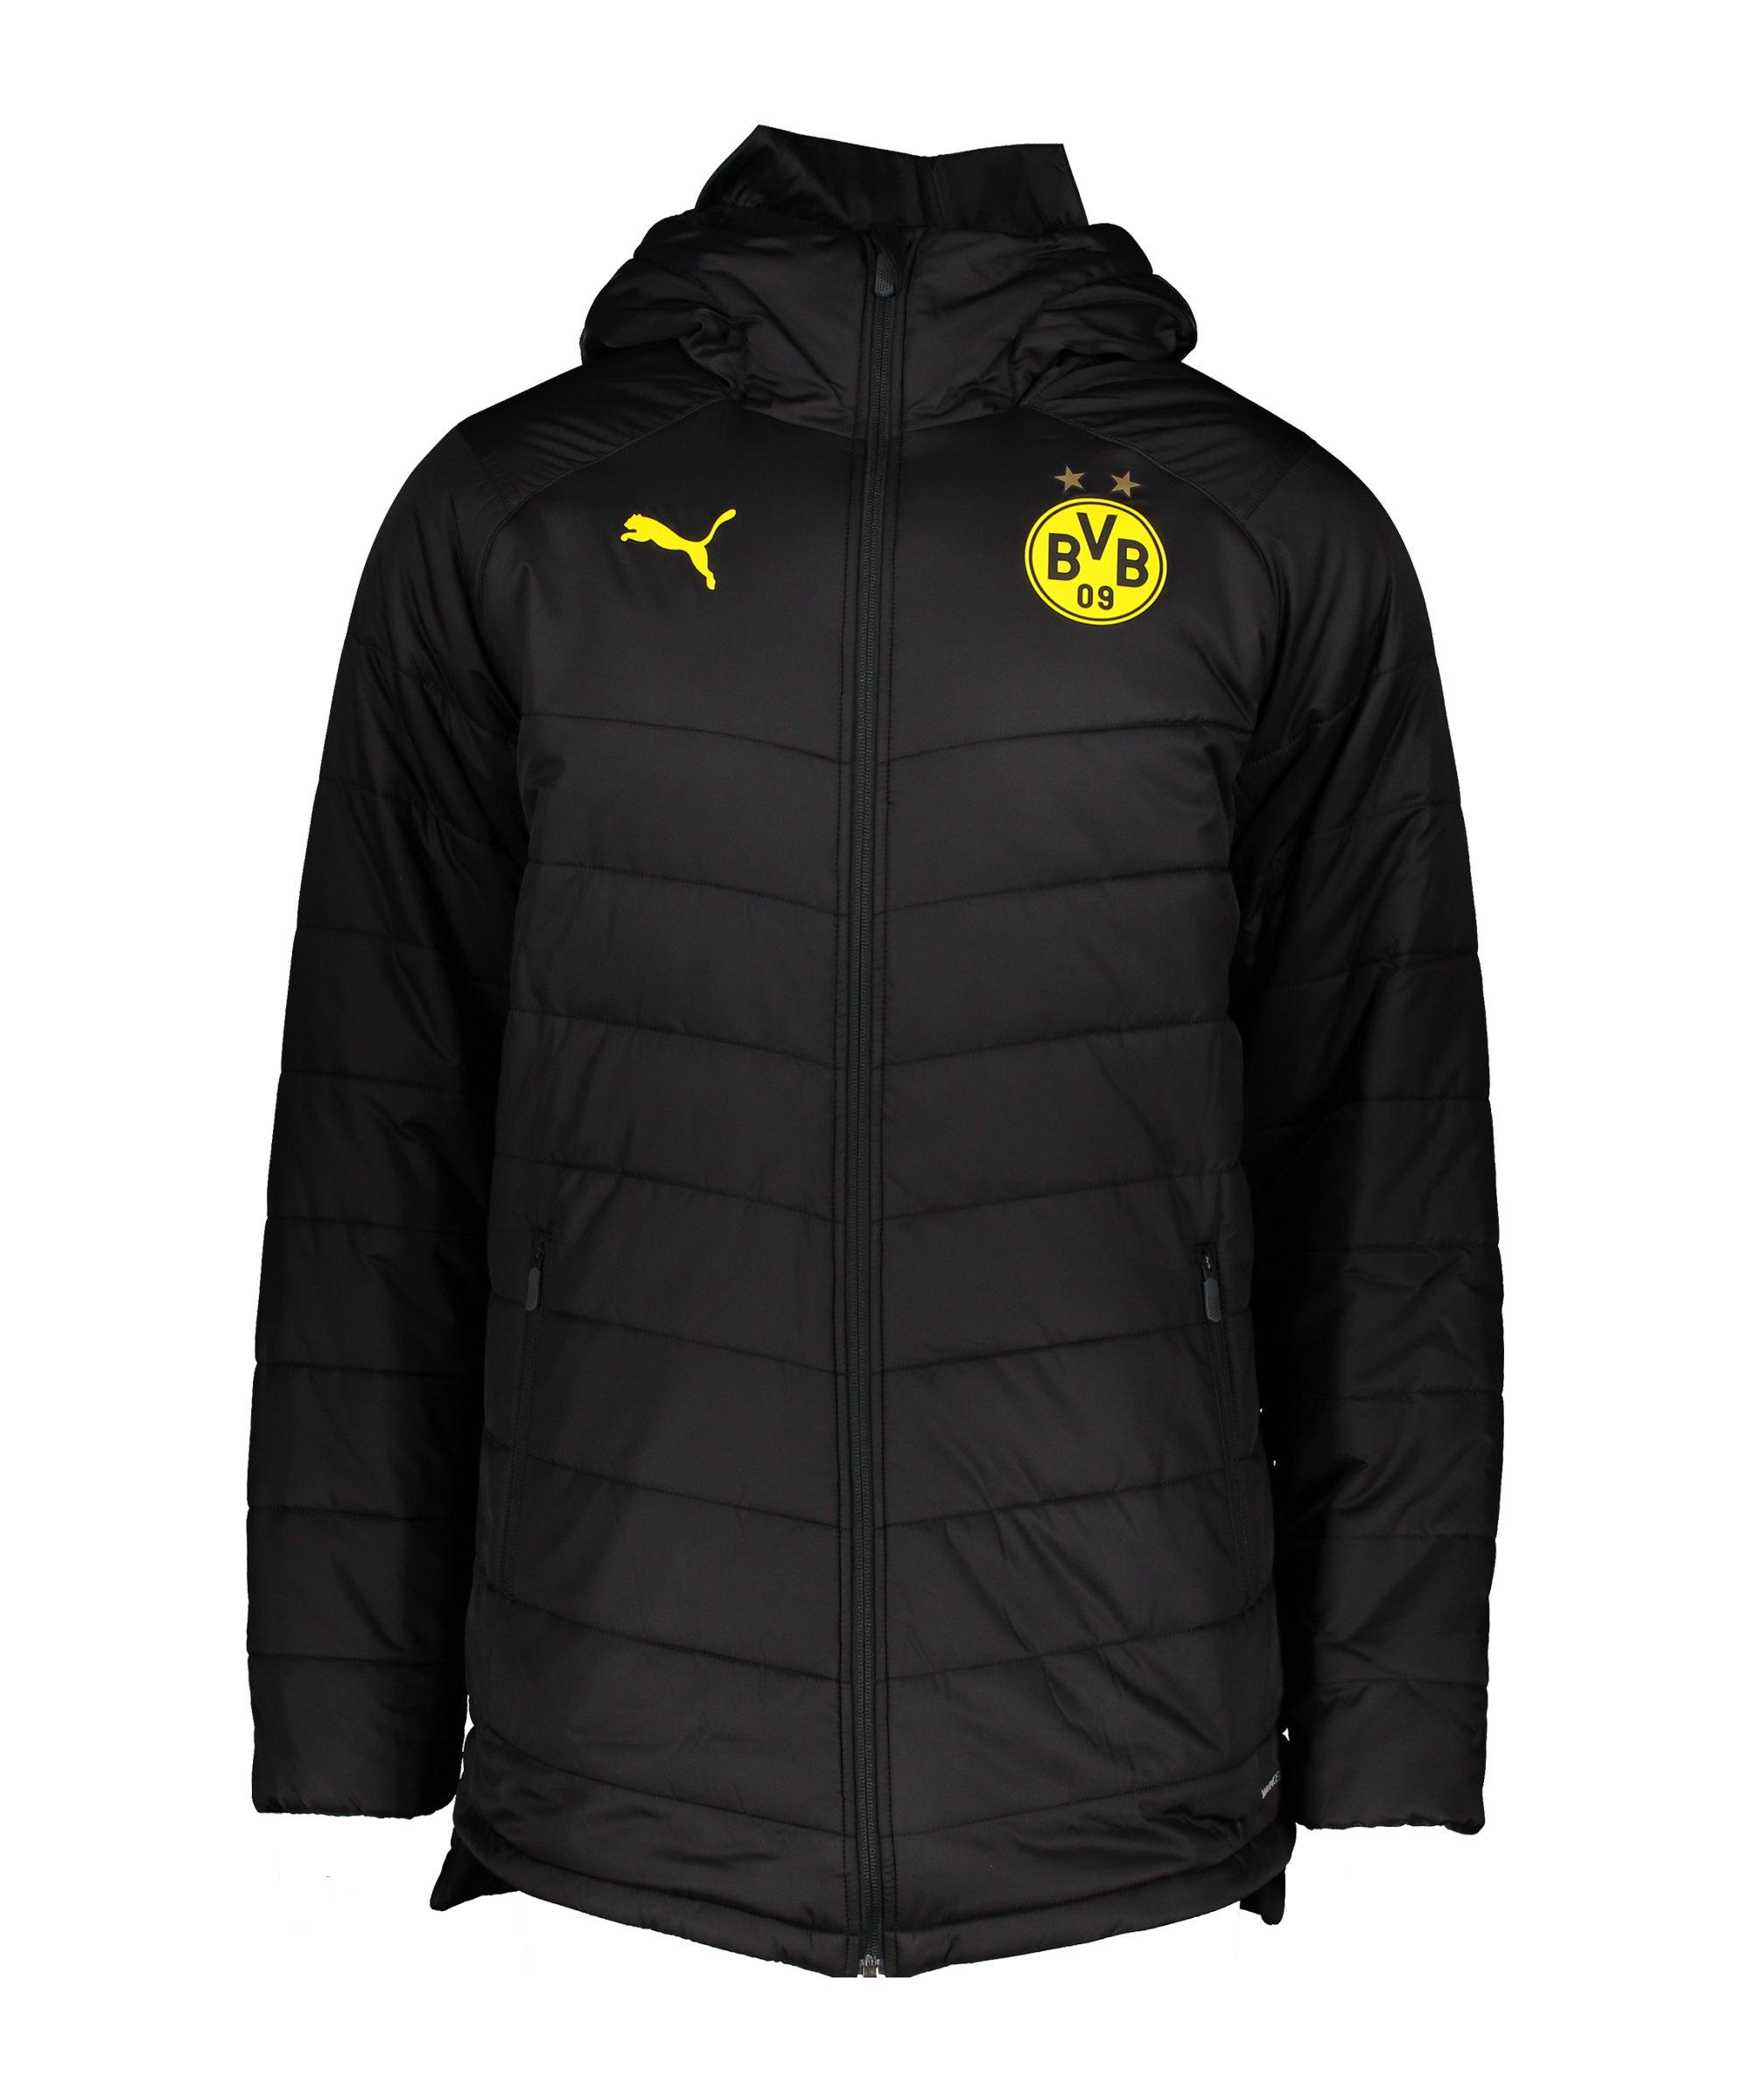 PUMA BVB Dortmund Stadionjacke Schwarz F02 - schwarz